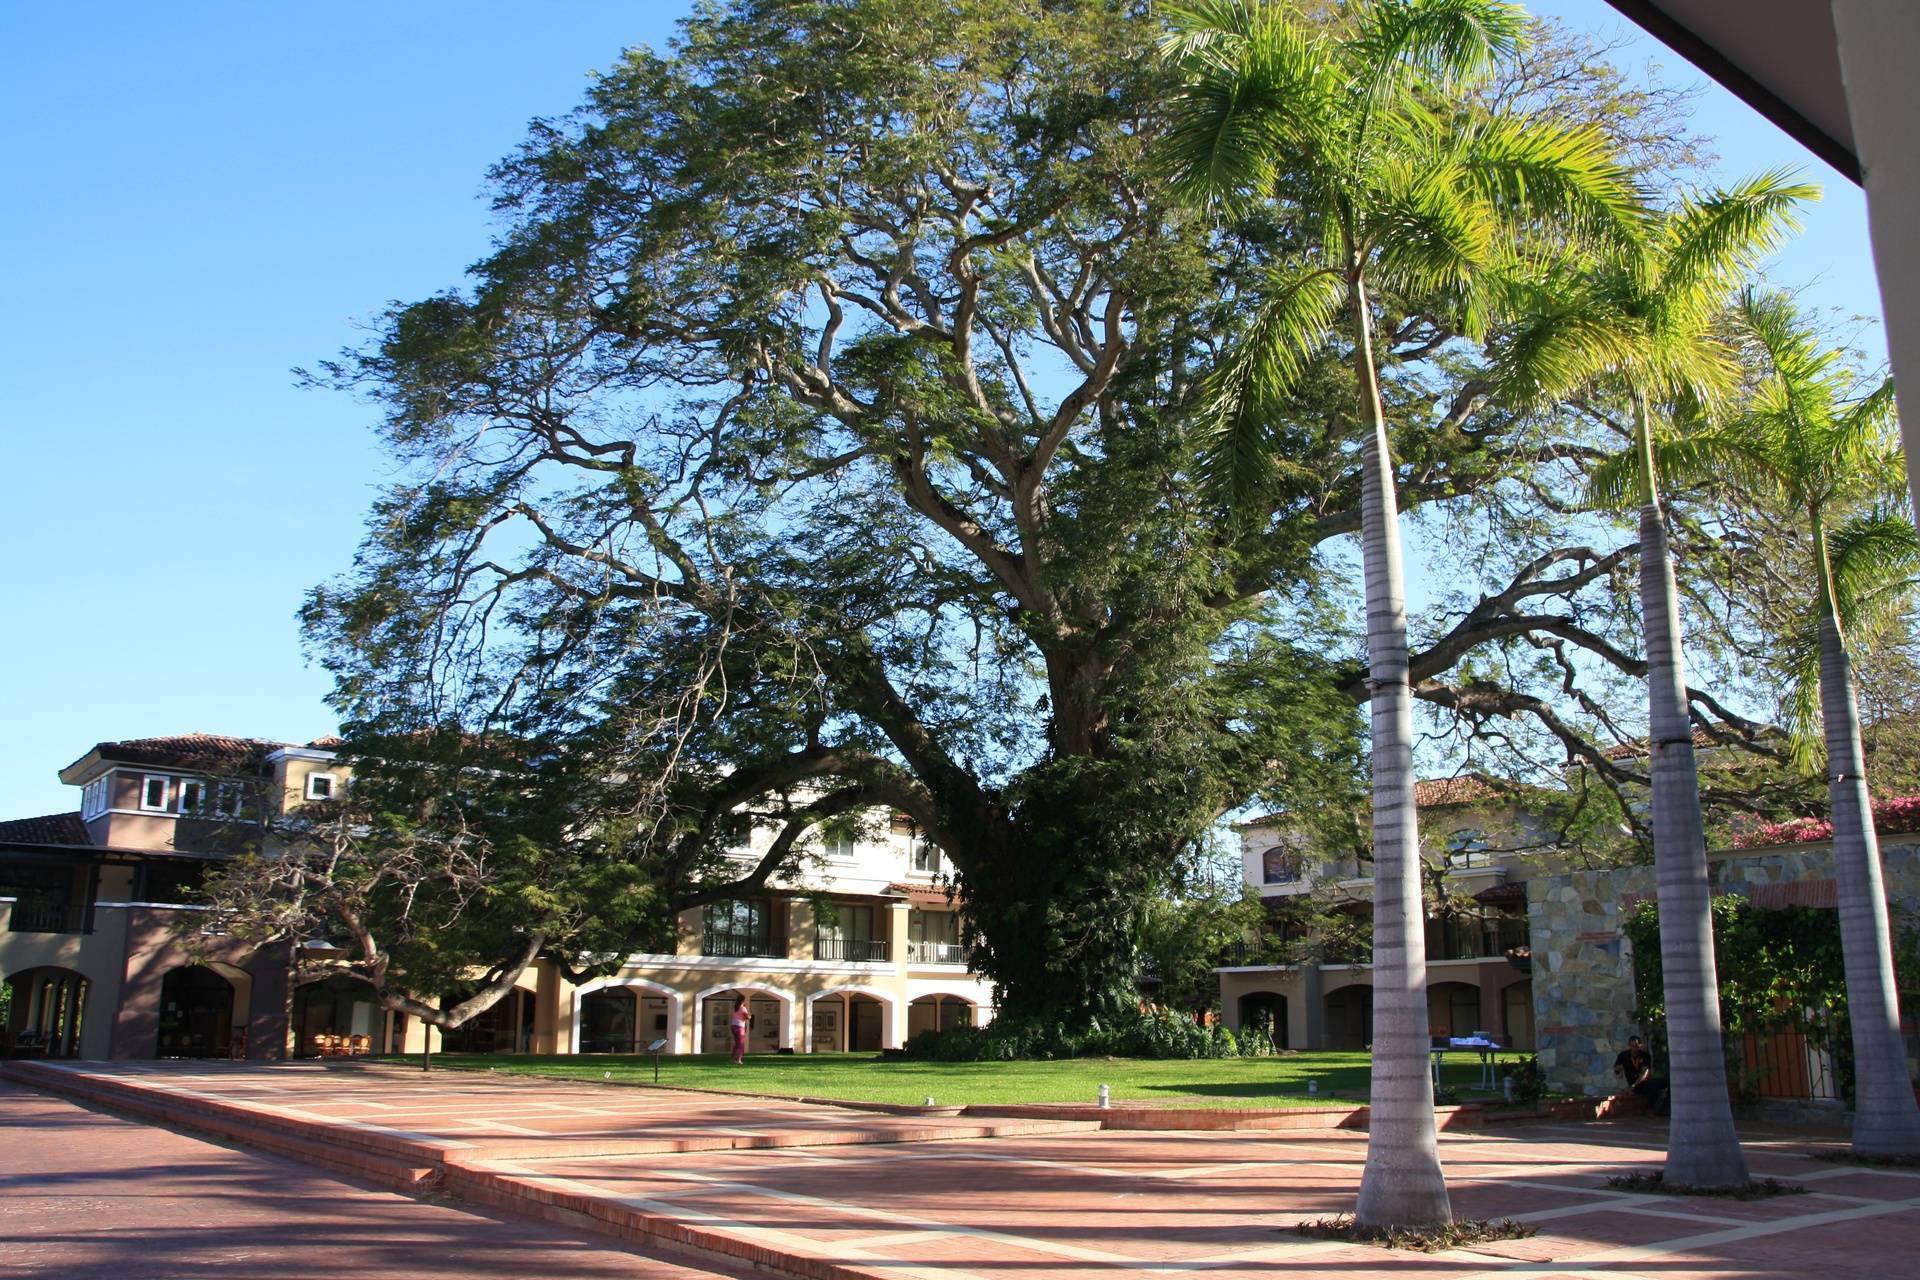 Tree at JW Marriott Hotel in Playa Banca